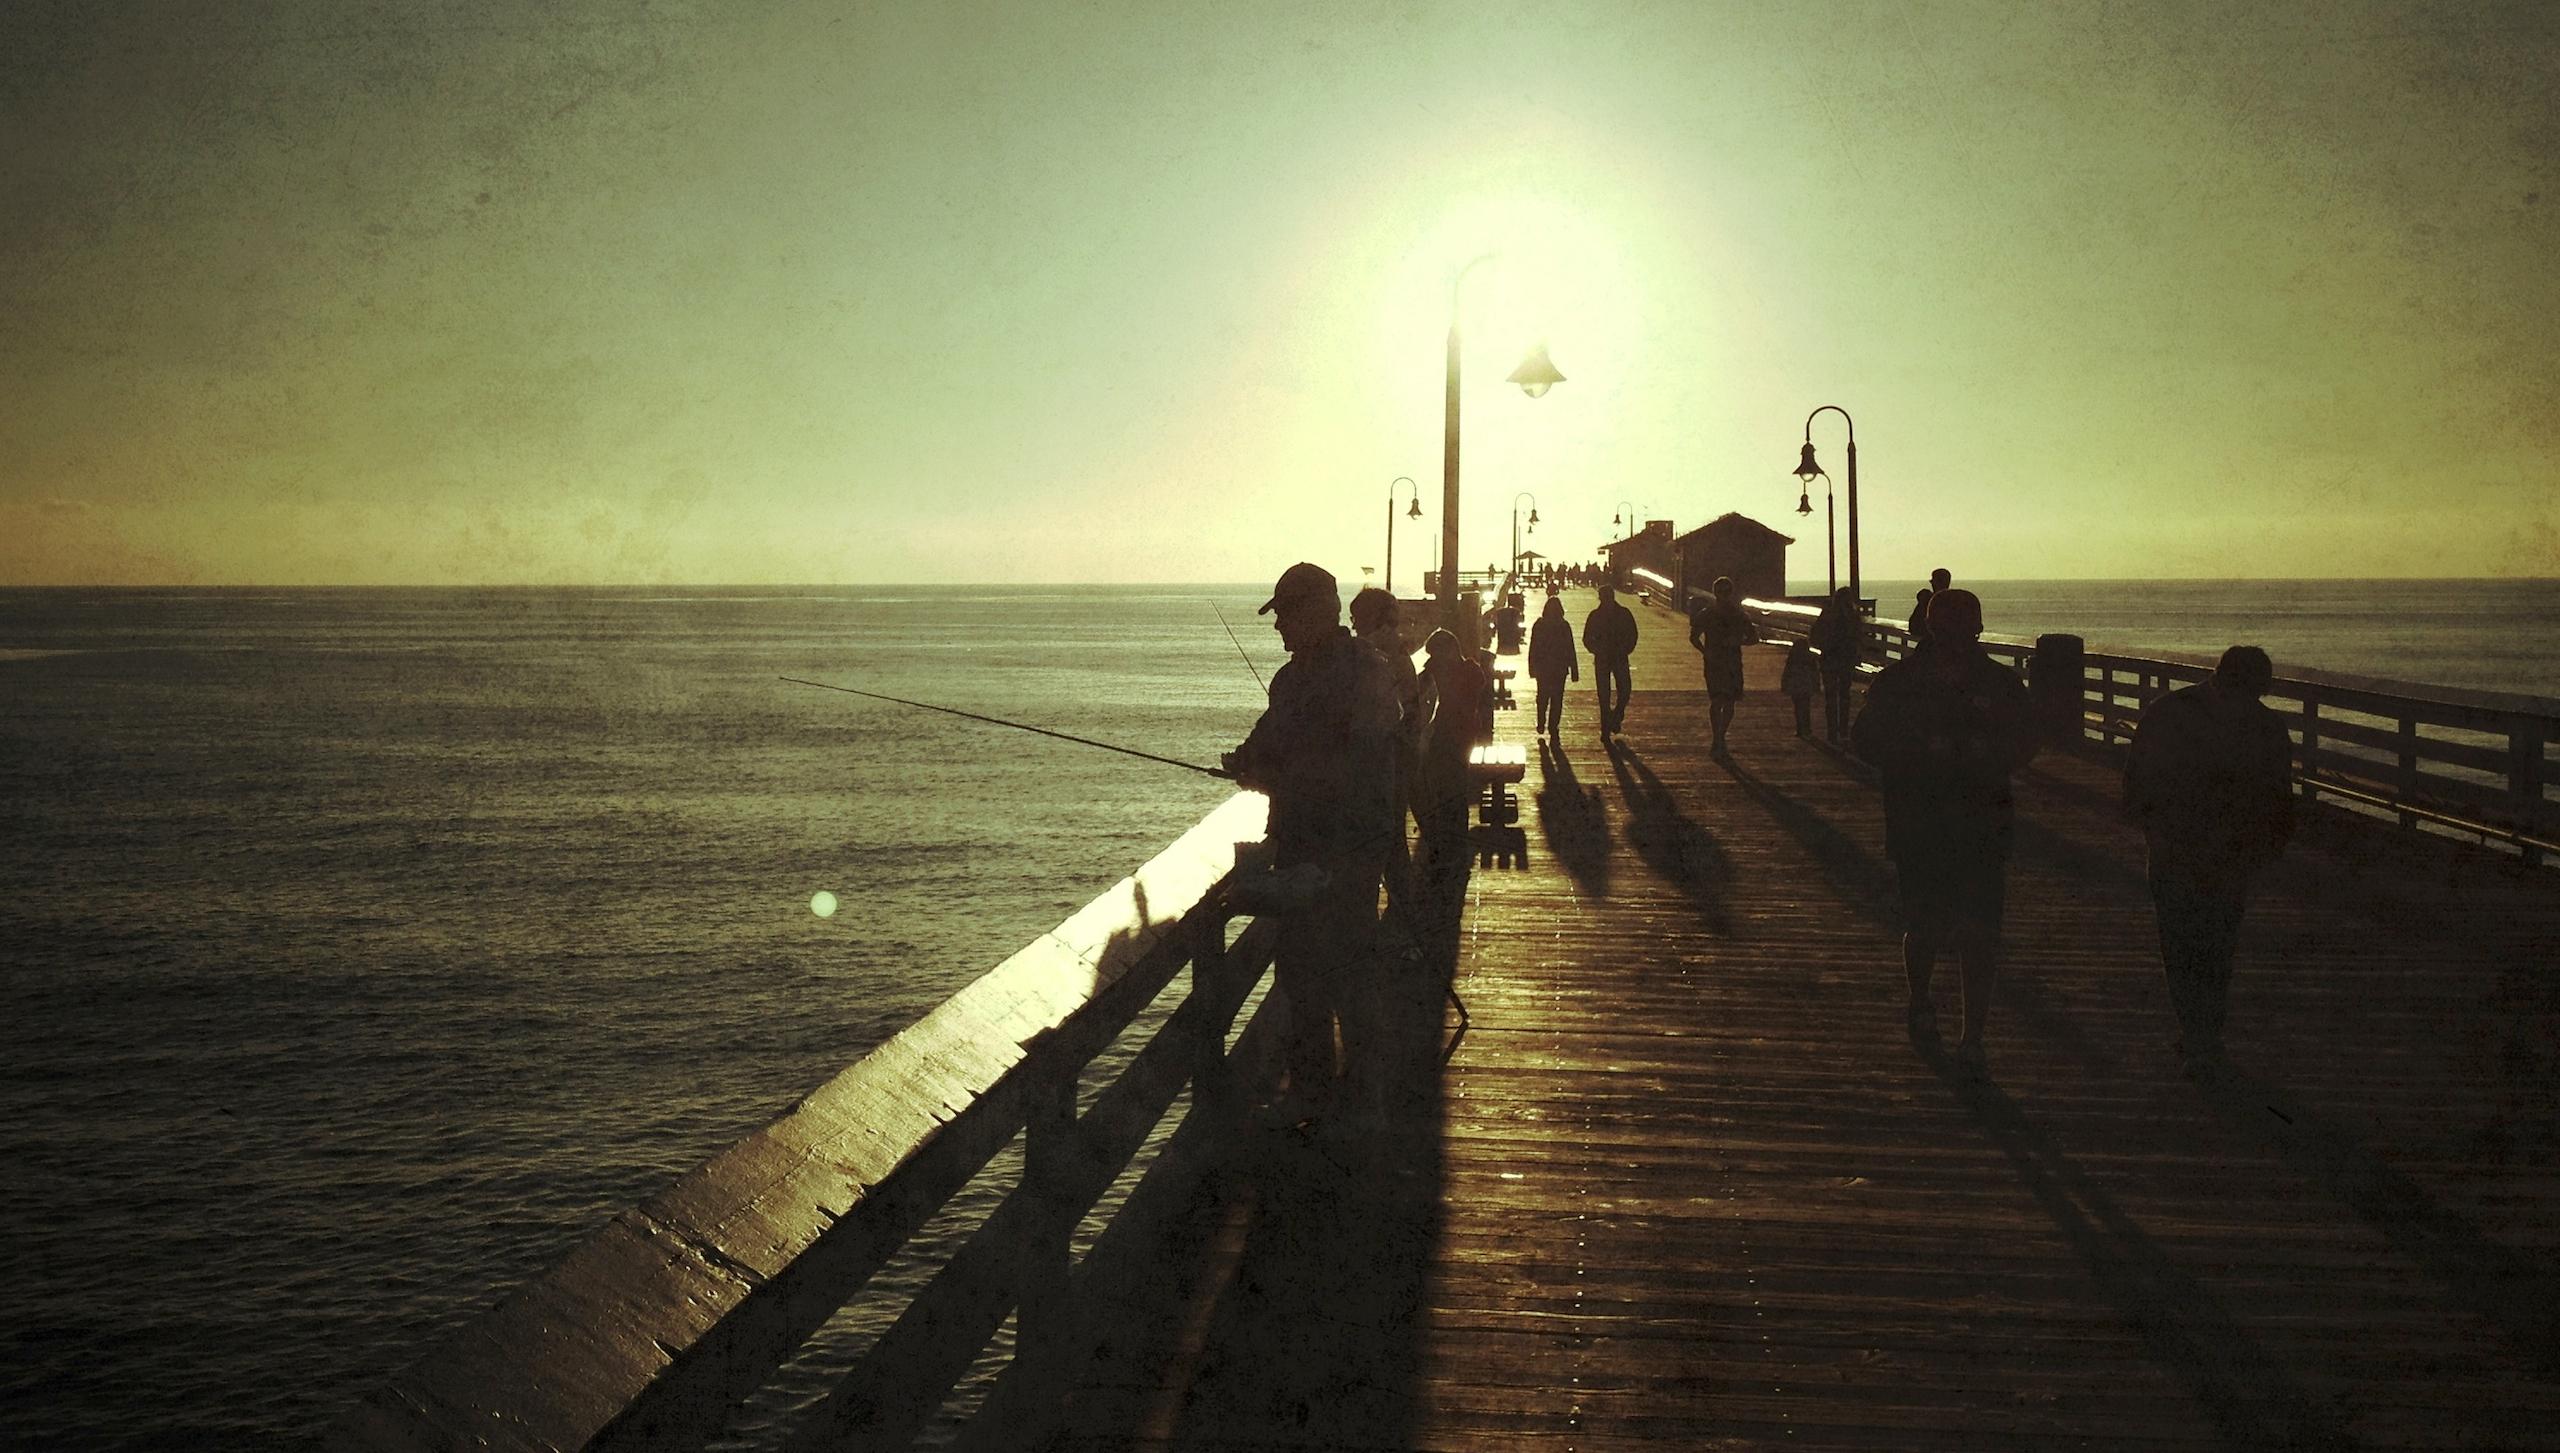 Oceanside Ca. boardwalk at sunset